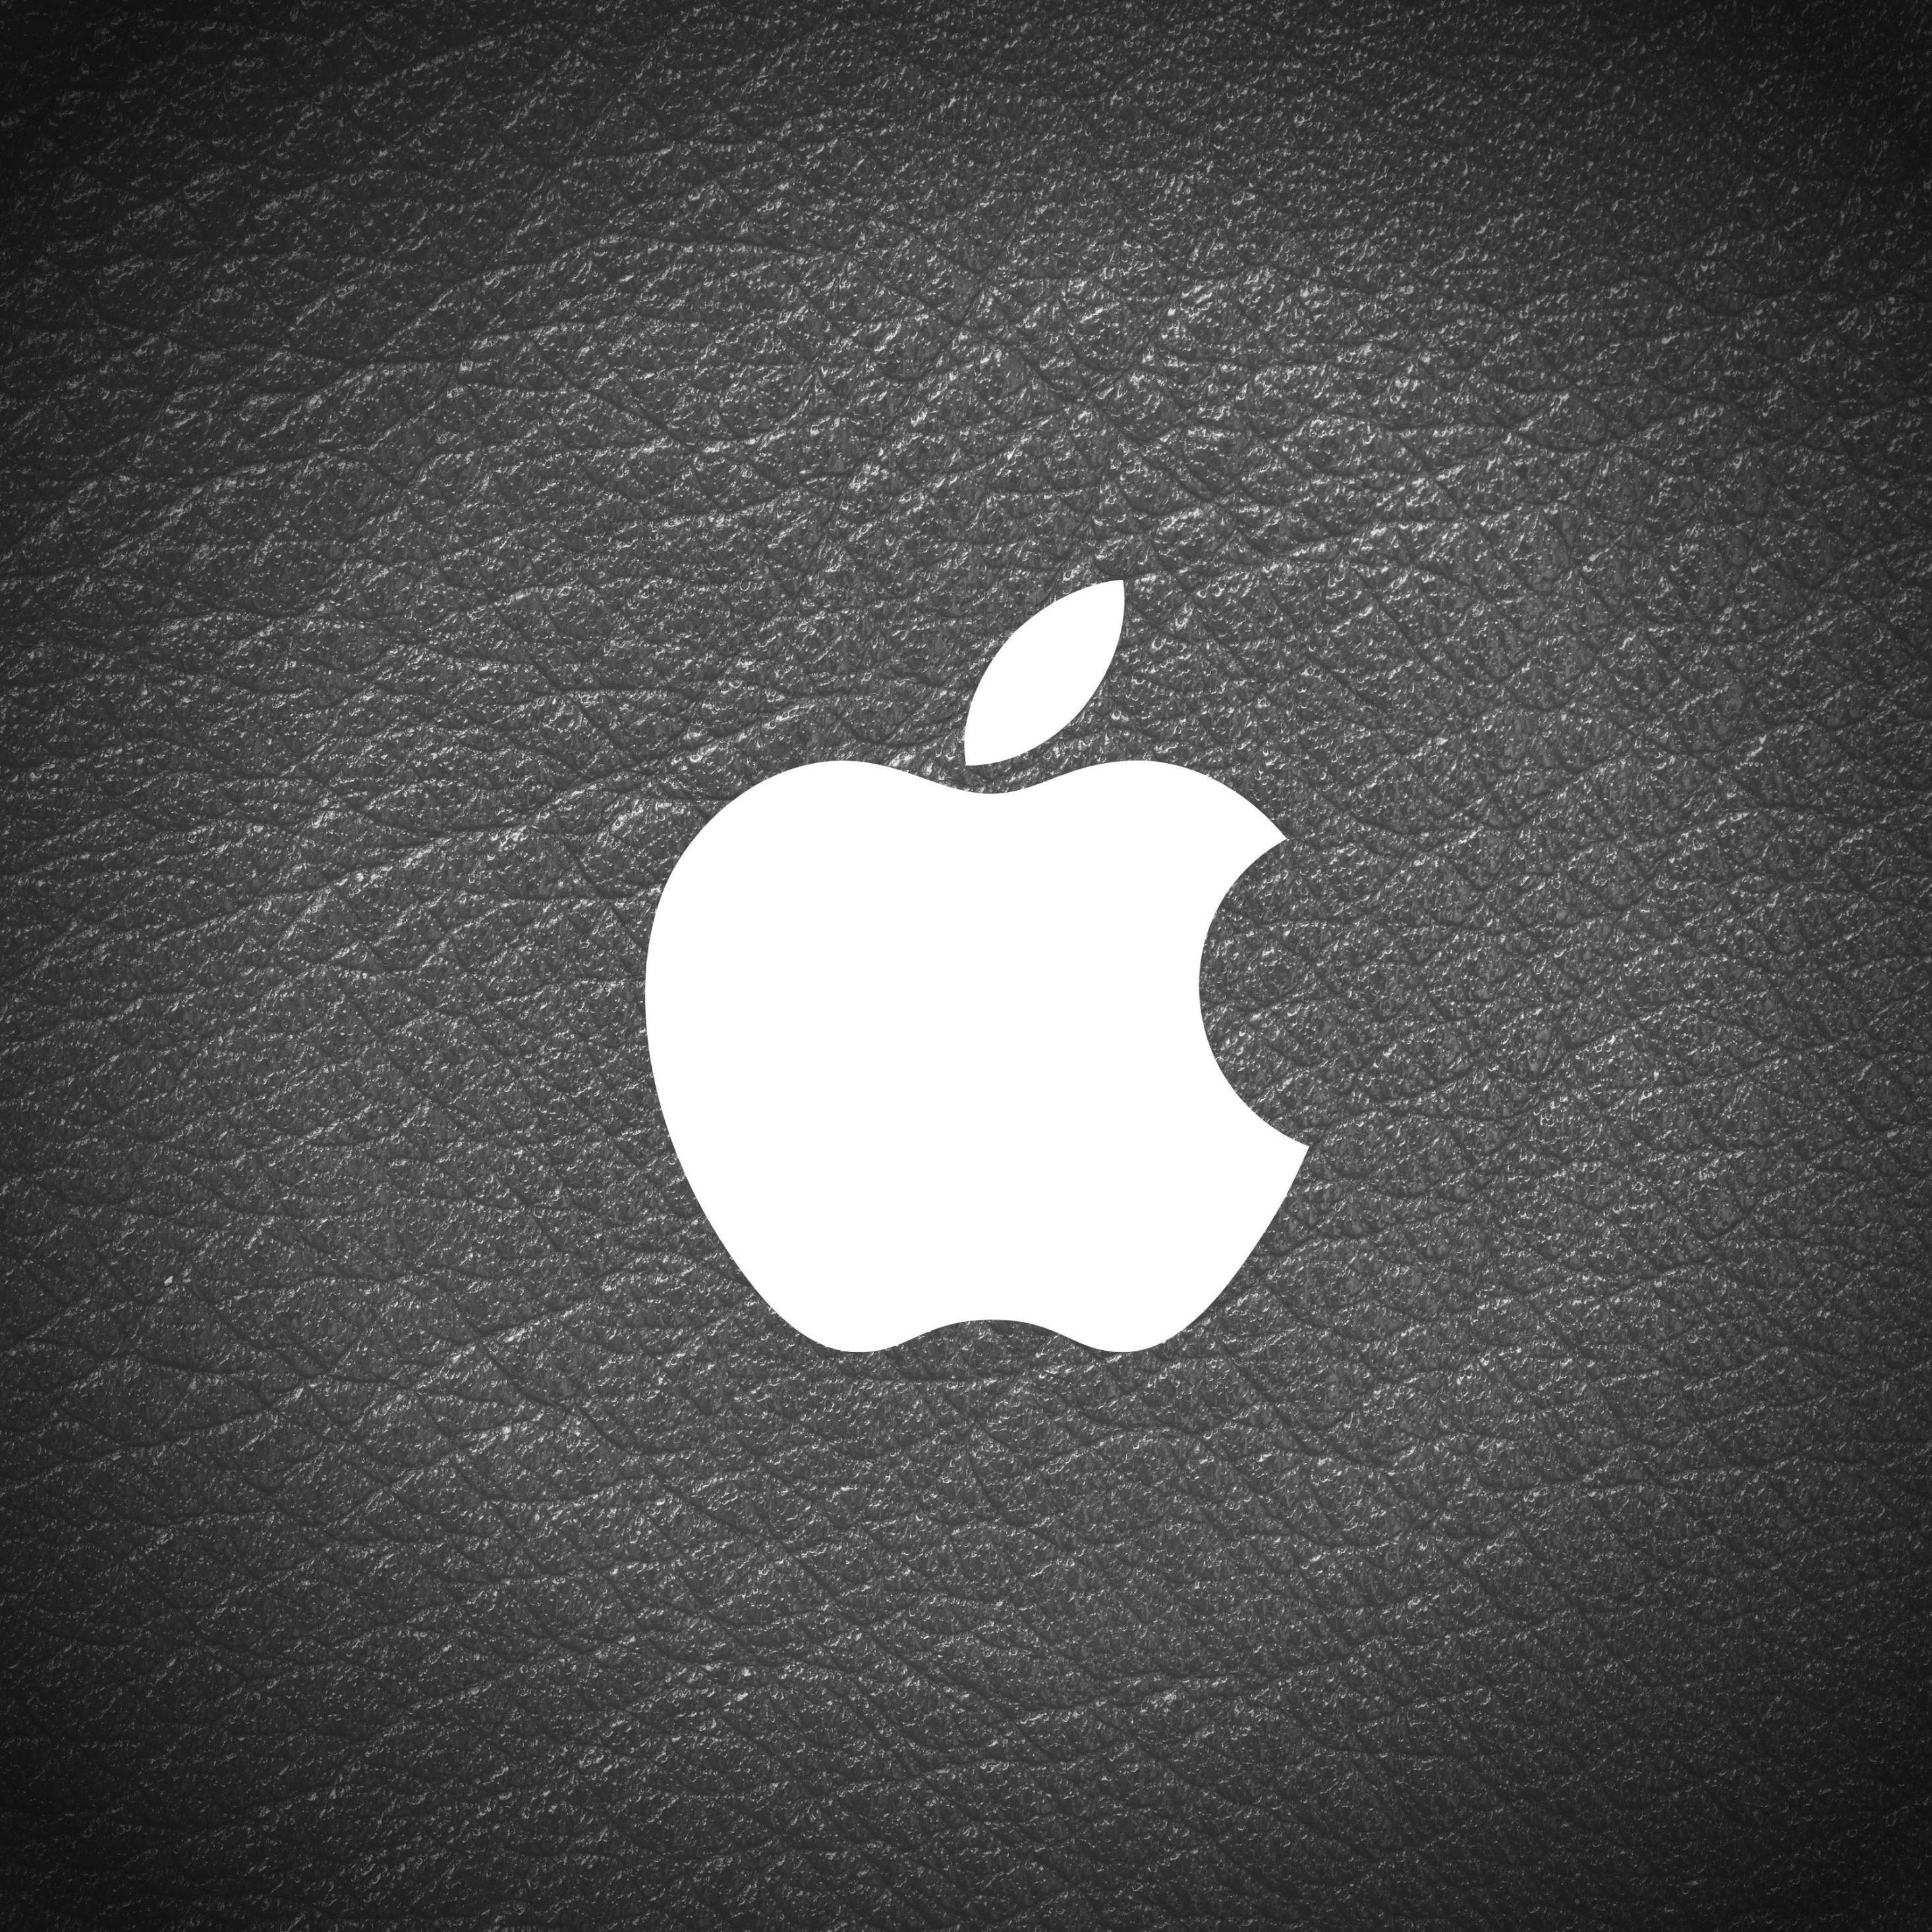 2932x2932 iPad Pro wallpaper 4k Apple Logo Leather Black and White iPad Wallpaper 2932x2932 pixels resolution